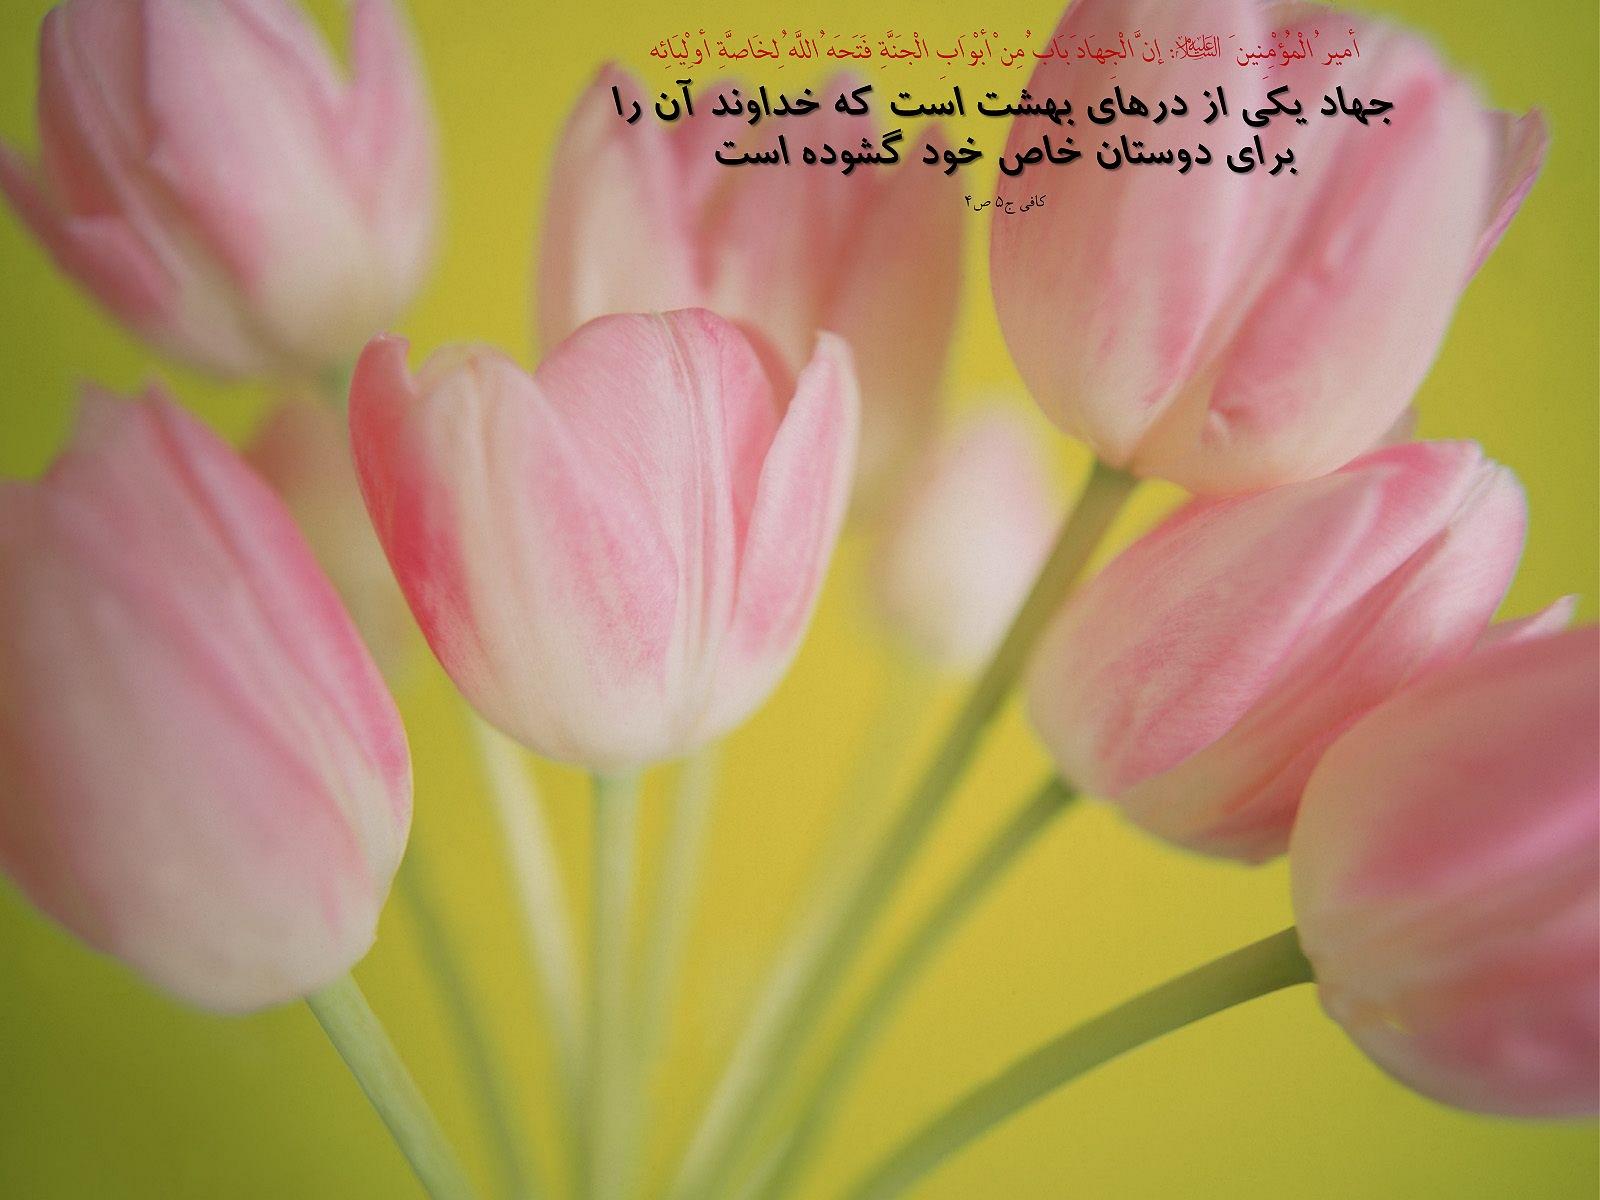 http://saina.gohardasht.com/uploaded/_6F97D5F2-9DE6-4FC0-B336-F32B9B94D6BD_.jpg